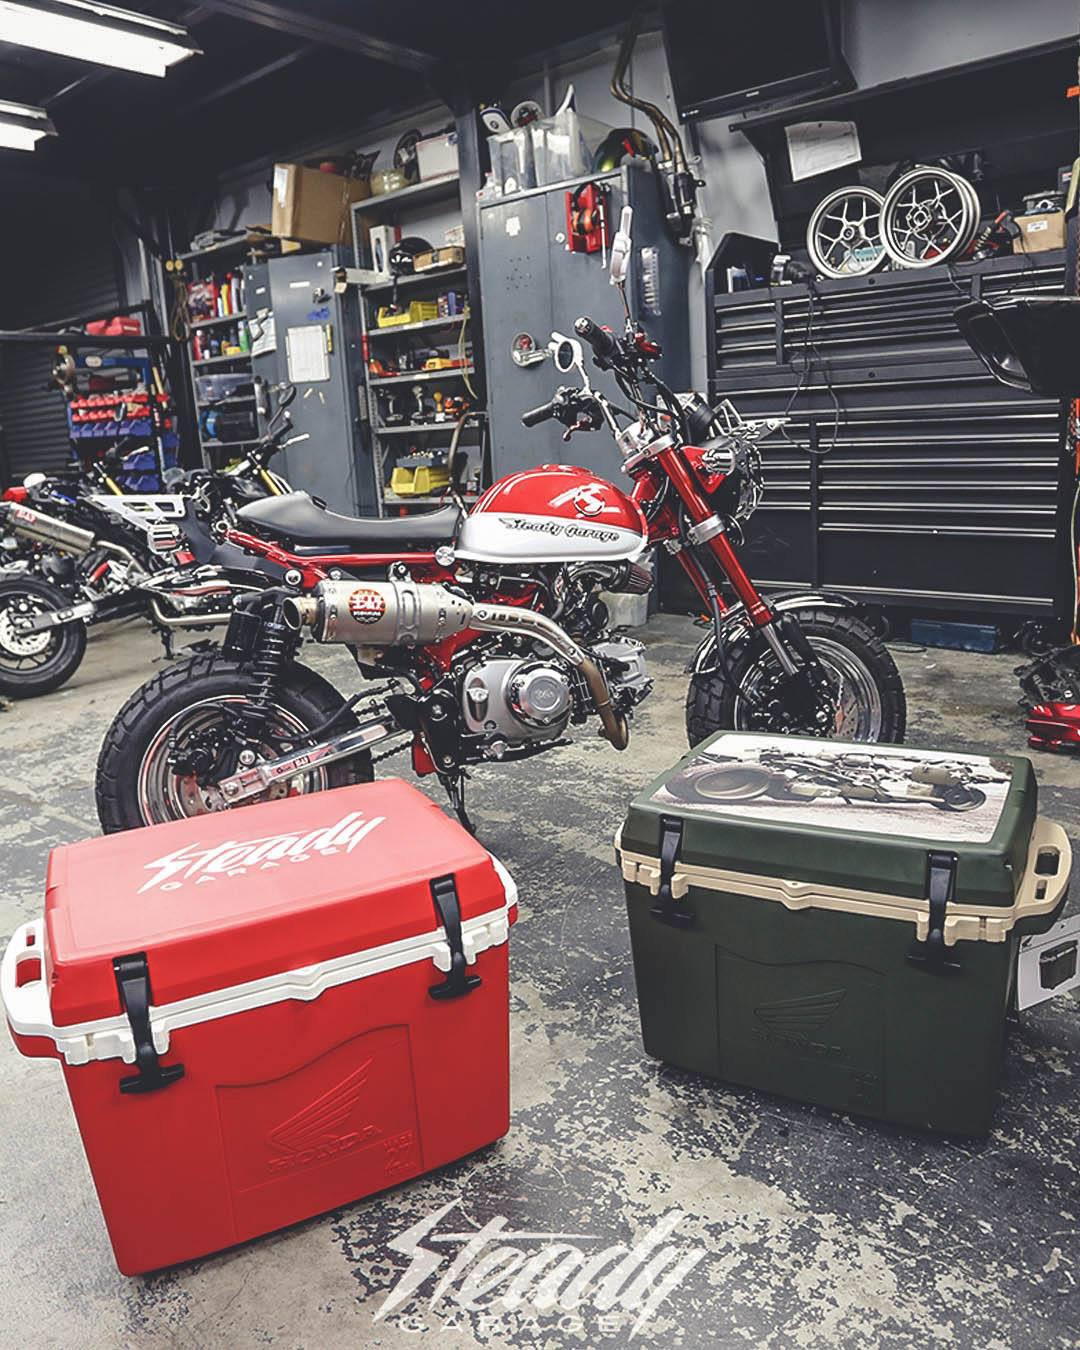 Le Honda Monkey 125 rouge de Steady Garage - mini4temps.fr